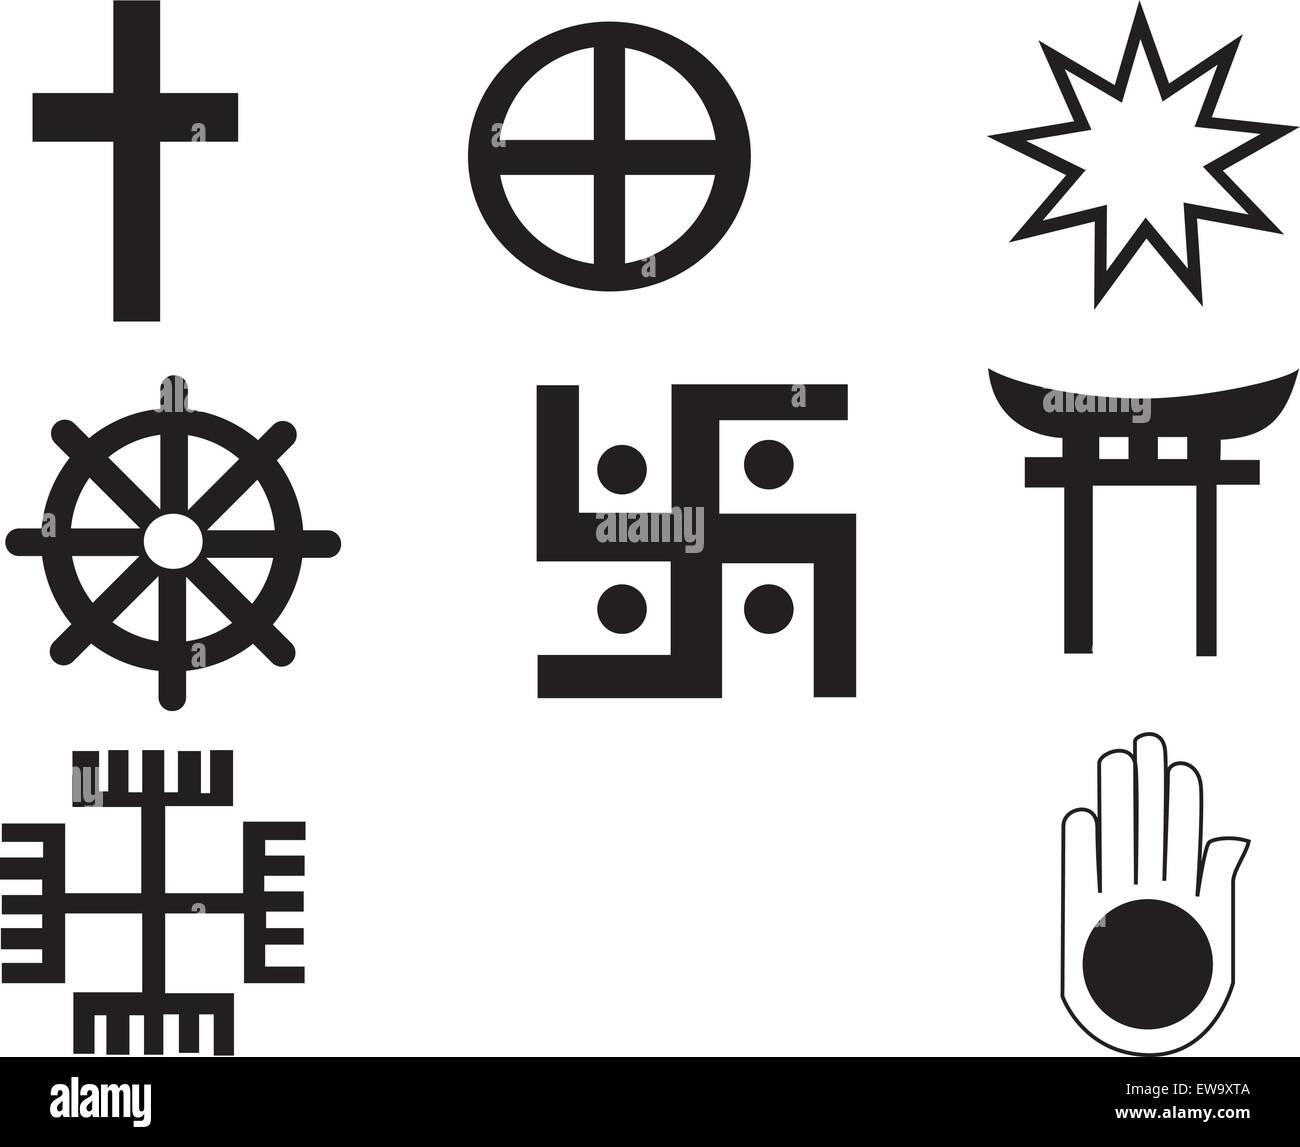 Christian Coexist Bumper Sticker